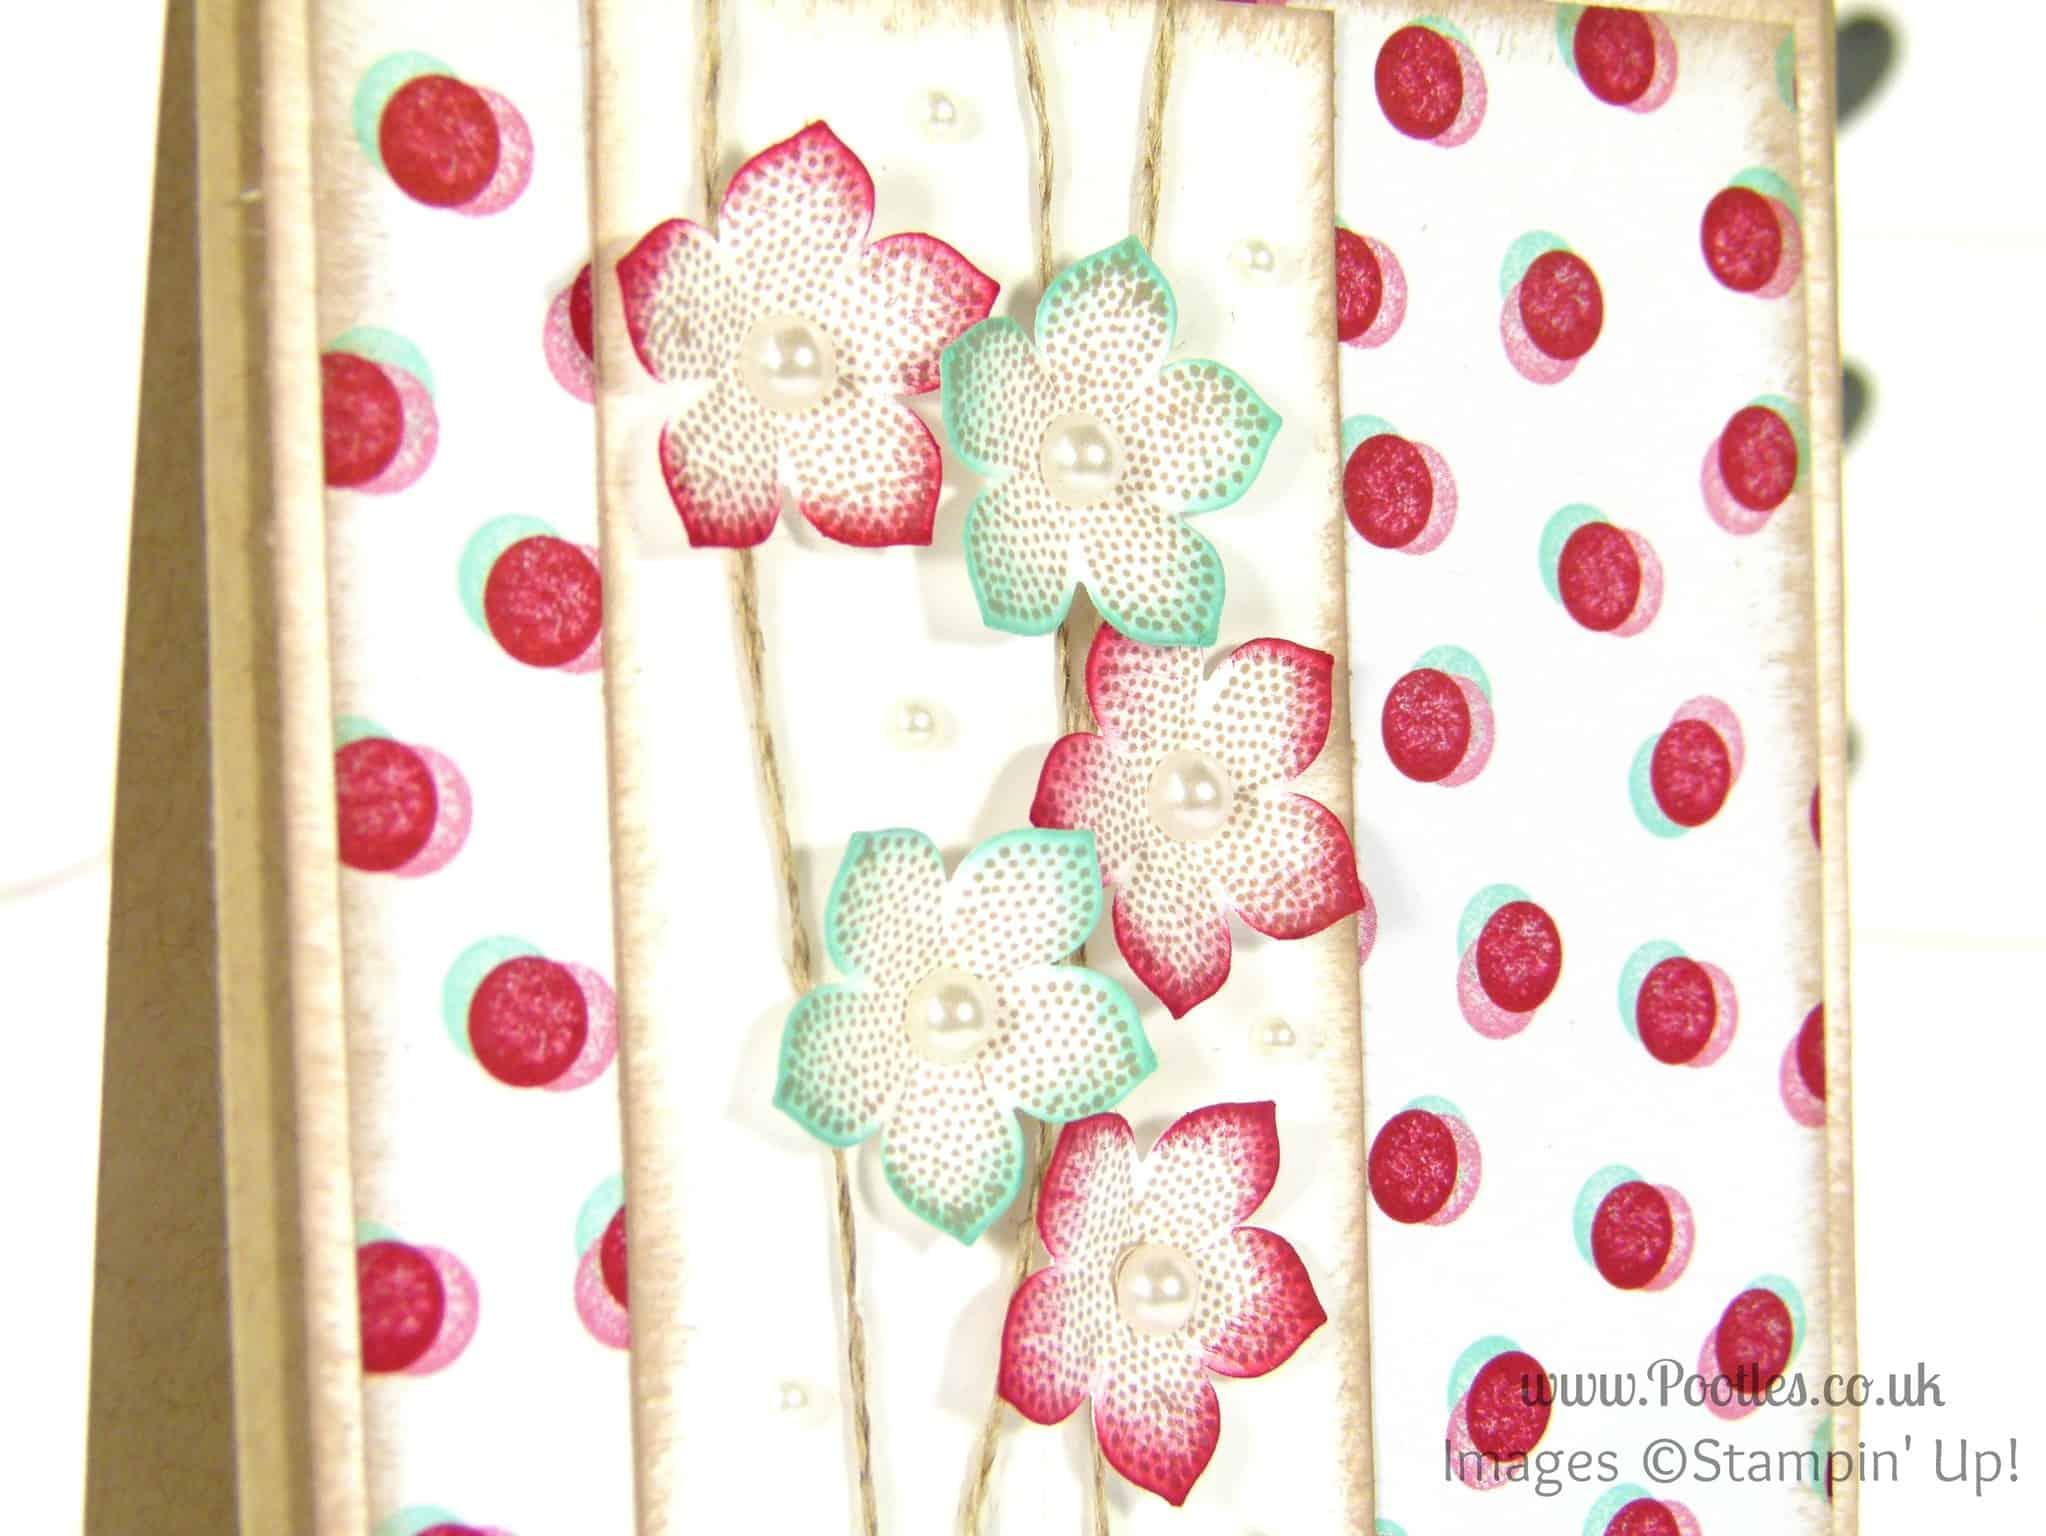 Stampin' Up! UK Demonstrator Pootles - Pretty Petite Fresh Prints Floral Card petite petals detail